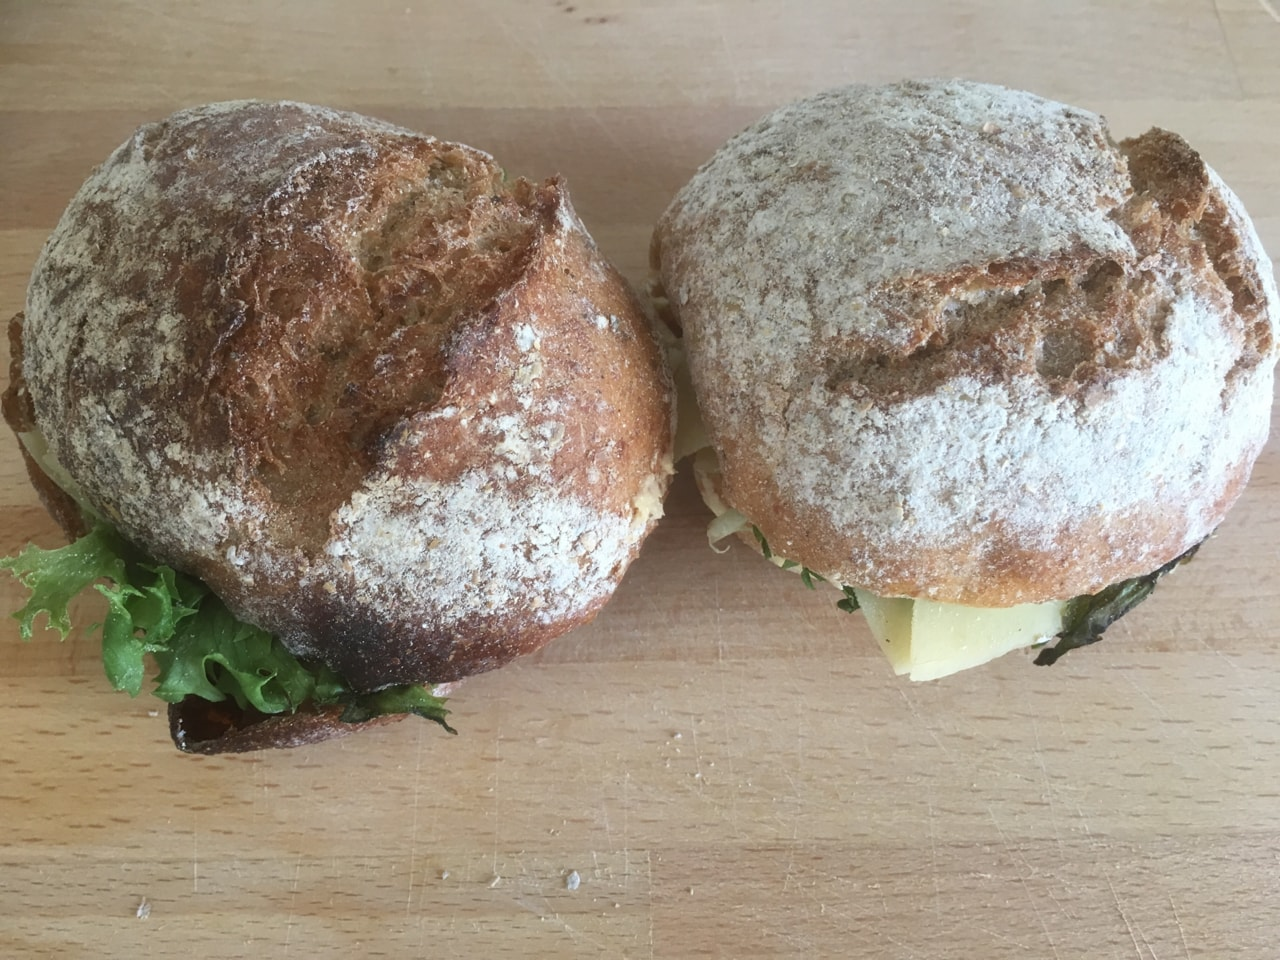 Vegetarian sandwiches from Fotografiska (21/8)